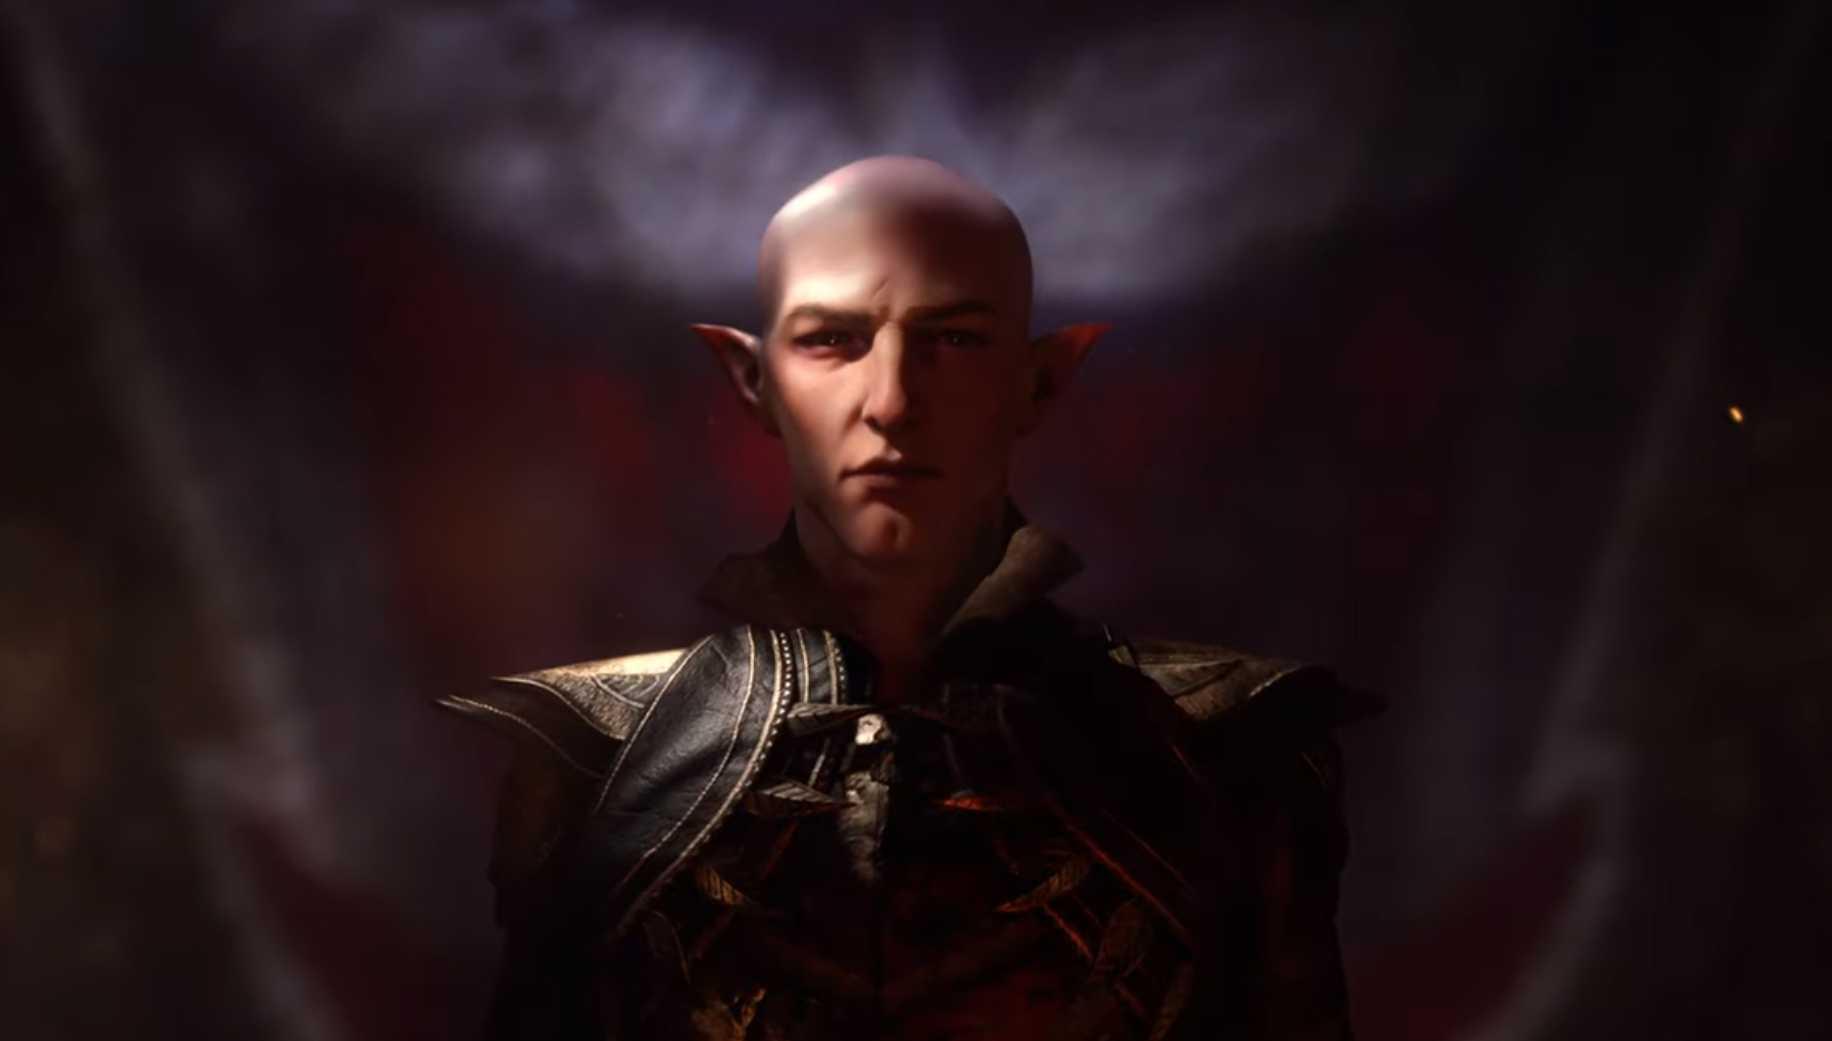 Вот трейлер Dragon Age 4 из The Game Awards